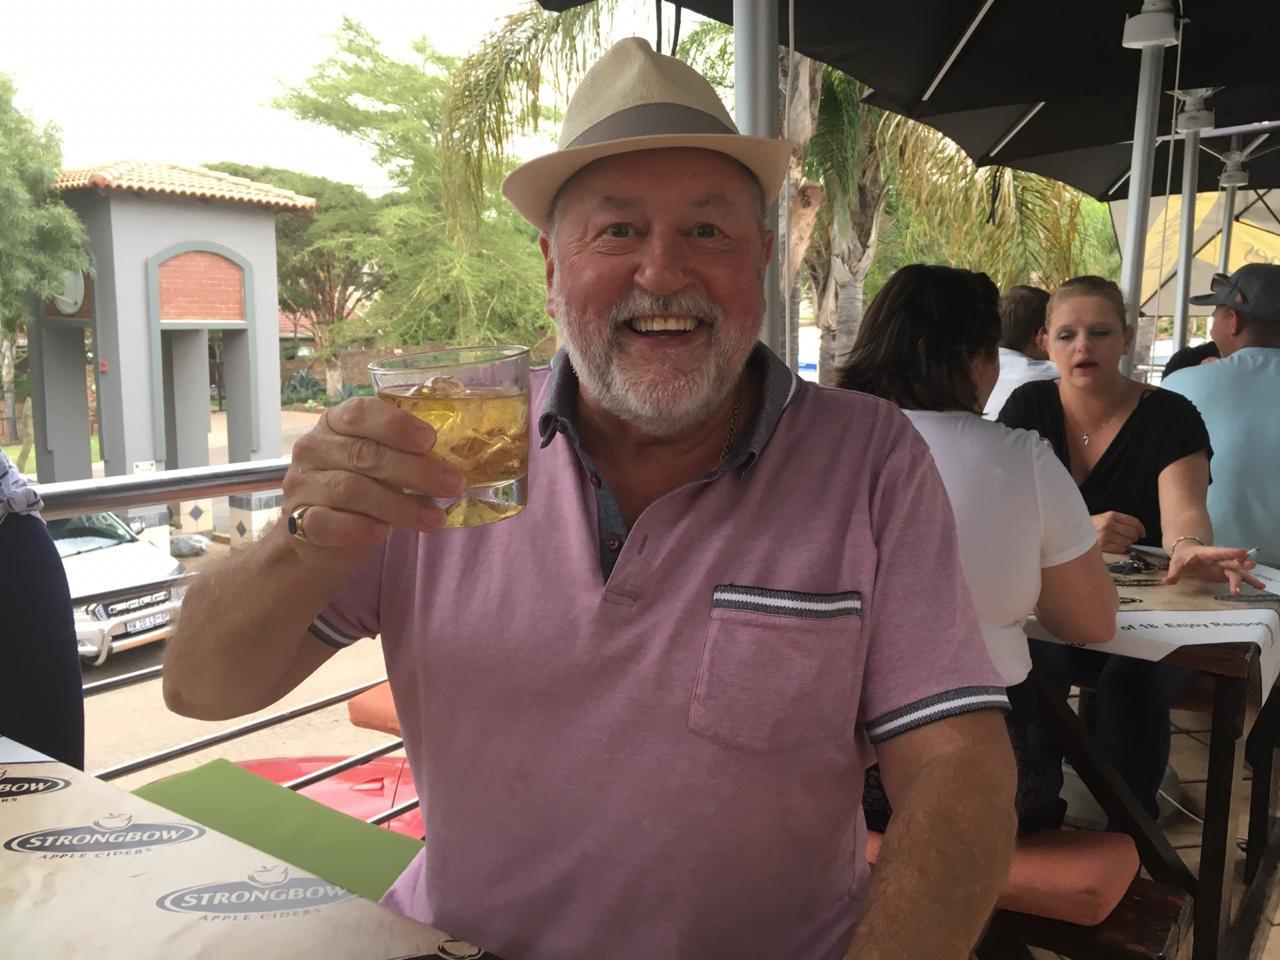 Meet the locals at The Hangover Sports Bar in Pretoria